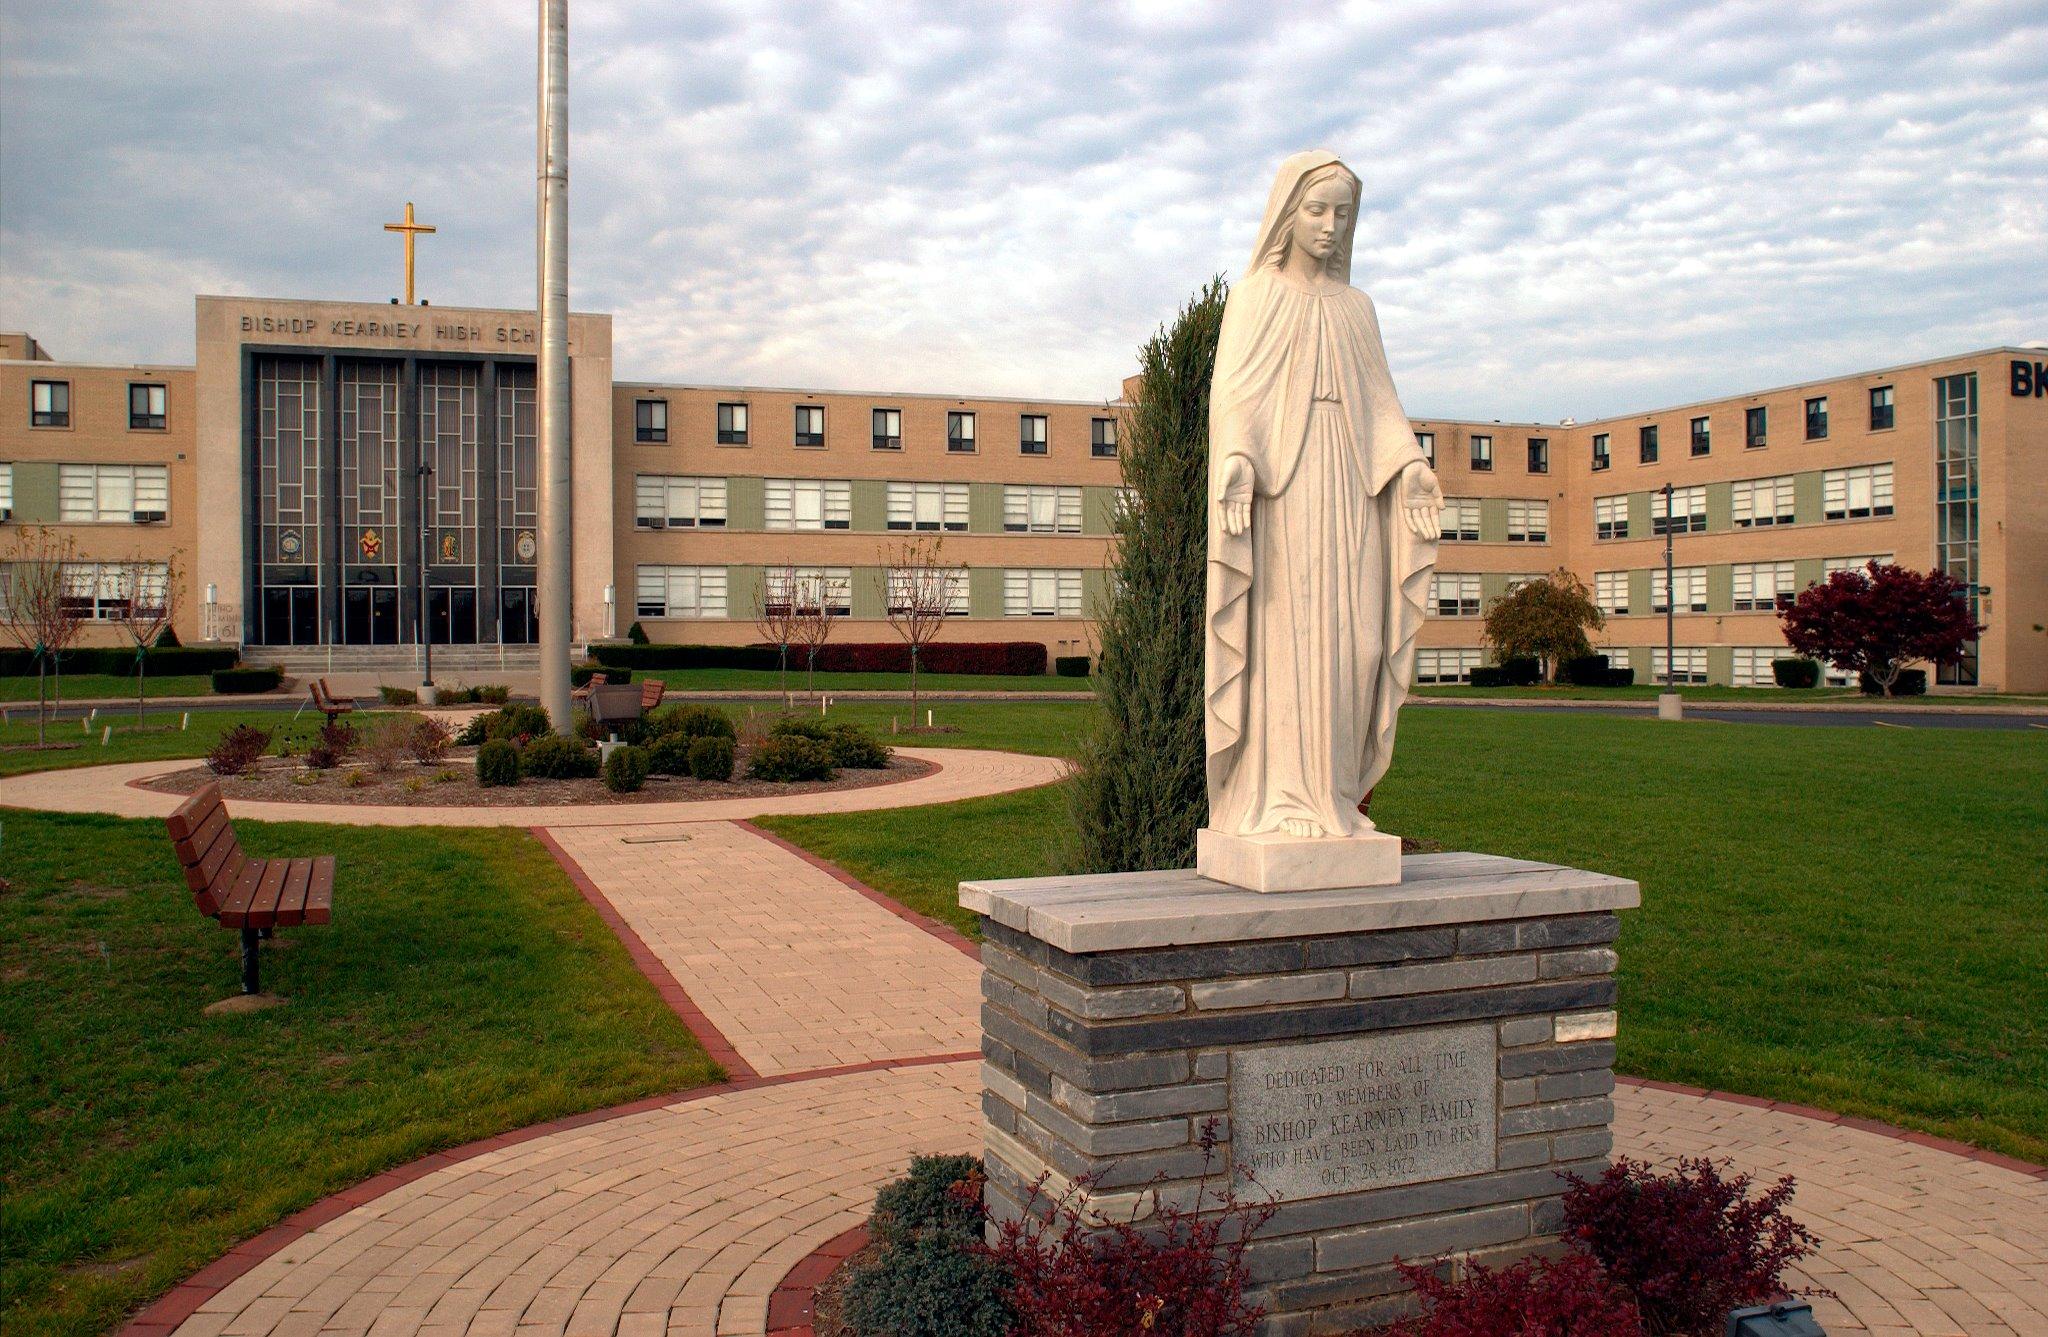 Bishop Kearney, Rochester